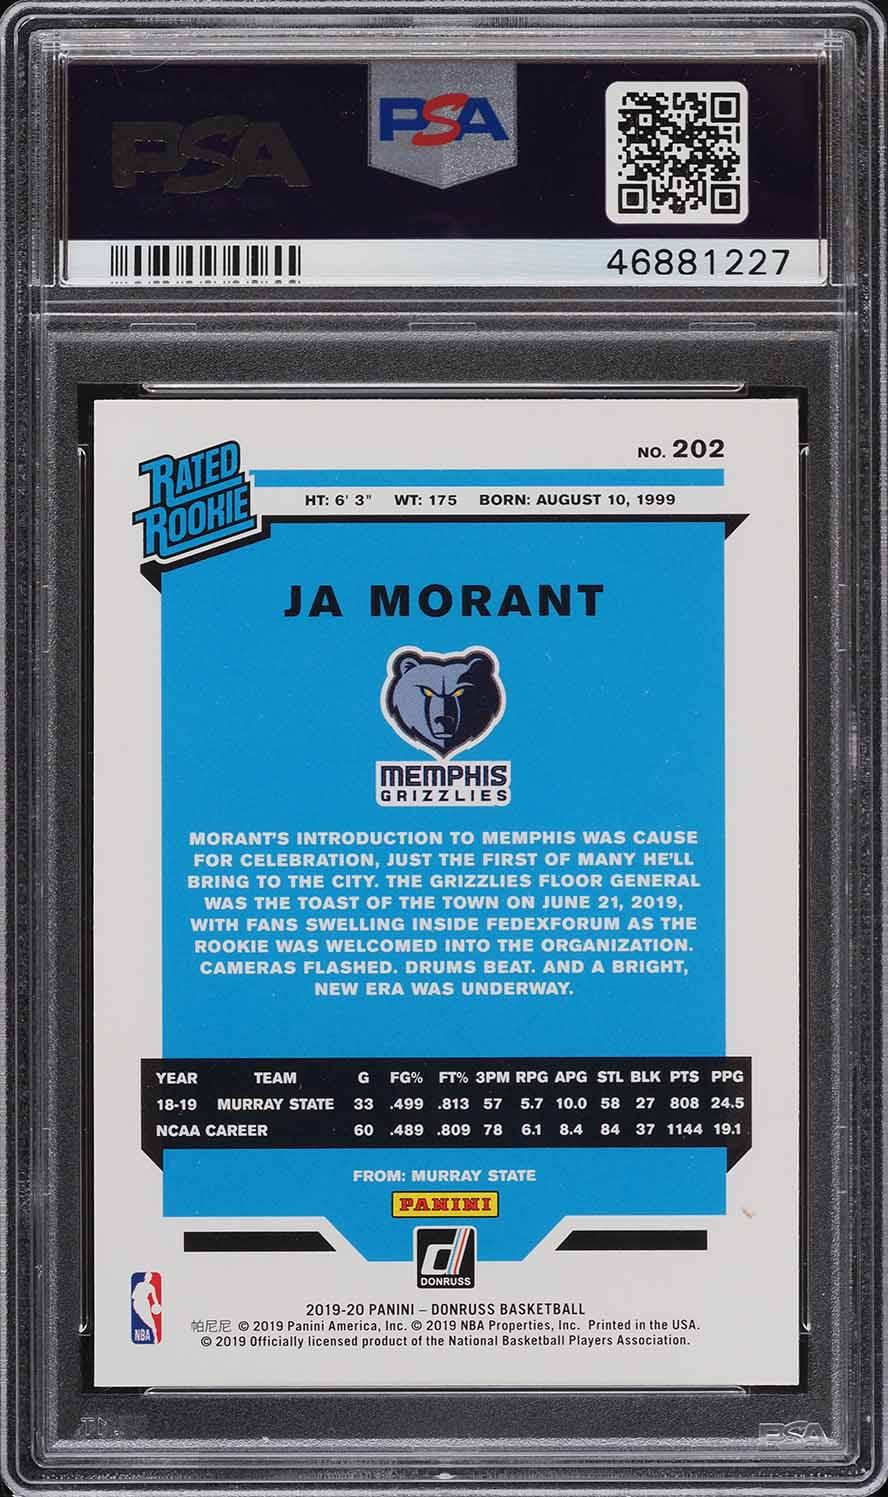 2019 Donruss Basketball Ja Morant ROOKIE RC #202 PSA 10 GEM MINT - Image 2